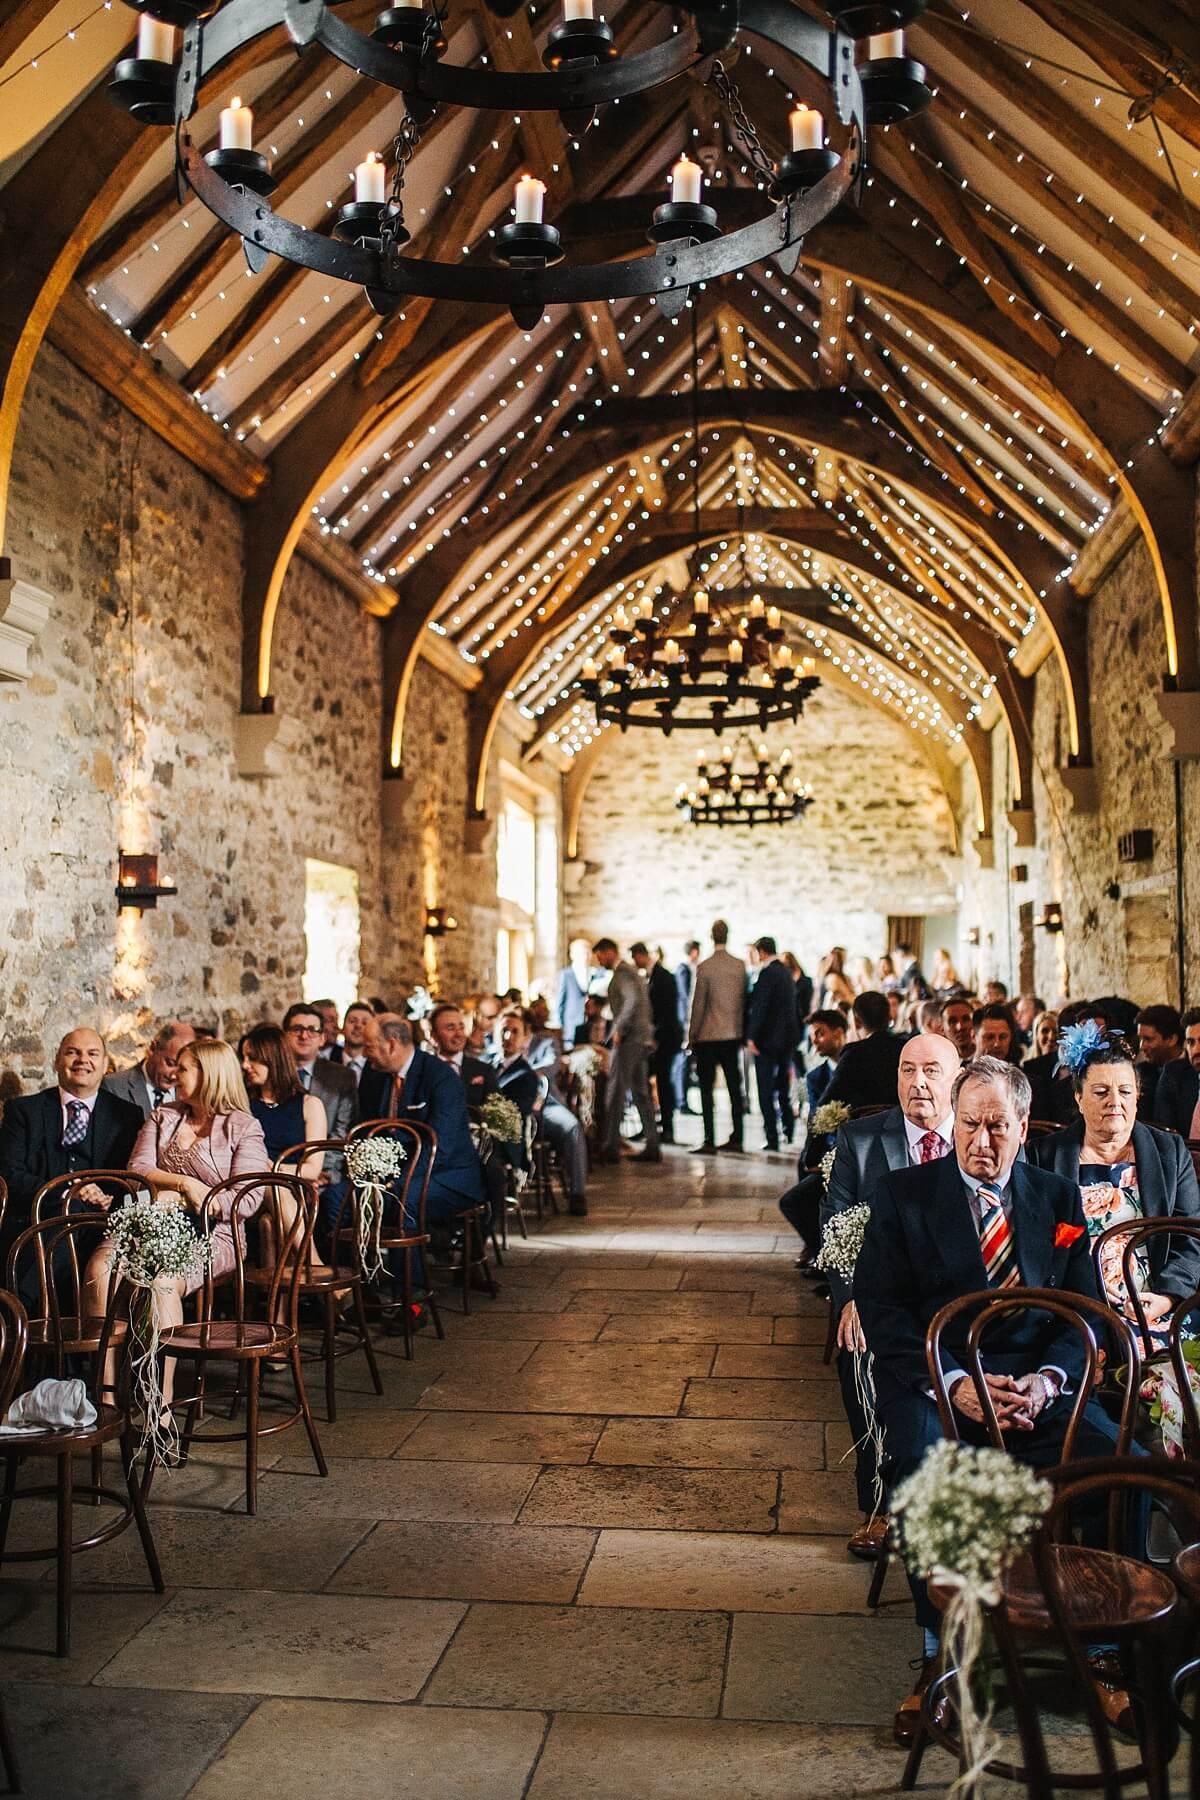 Healey barn wedding venue Northumberland